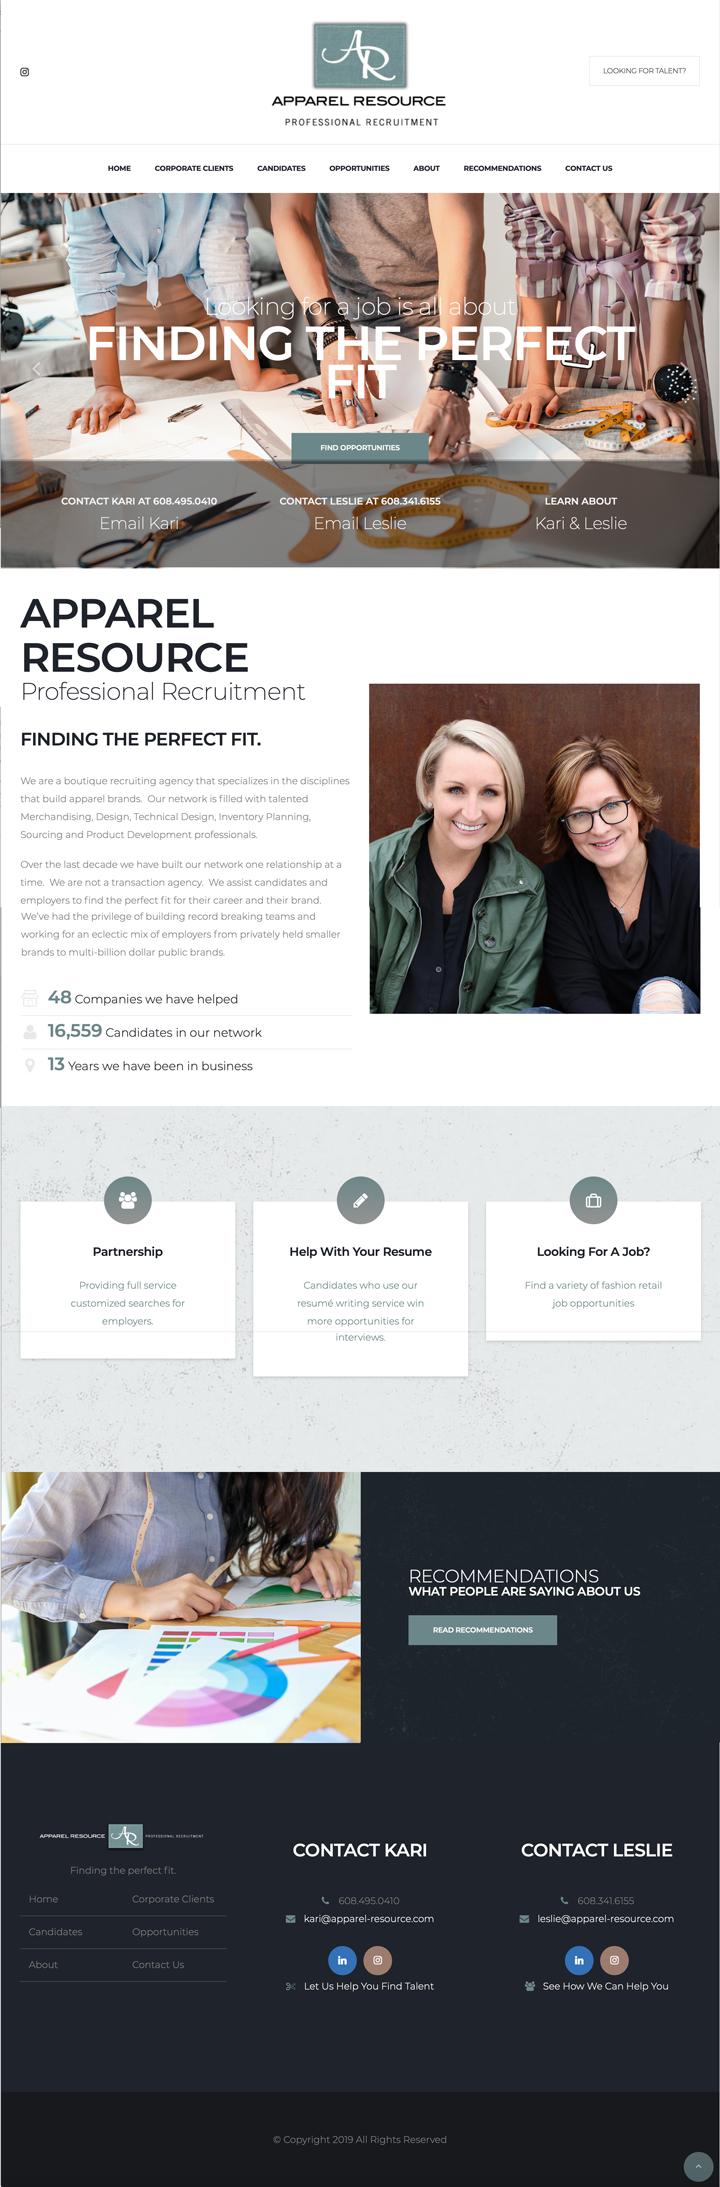 Apparel Resource Website Design